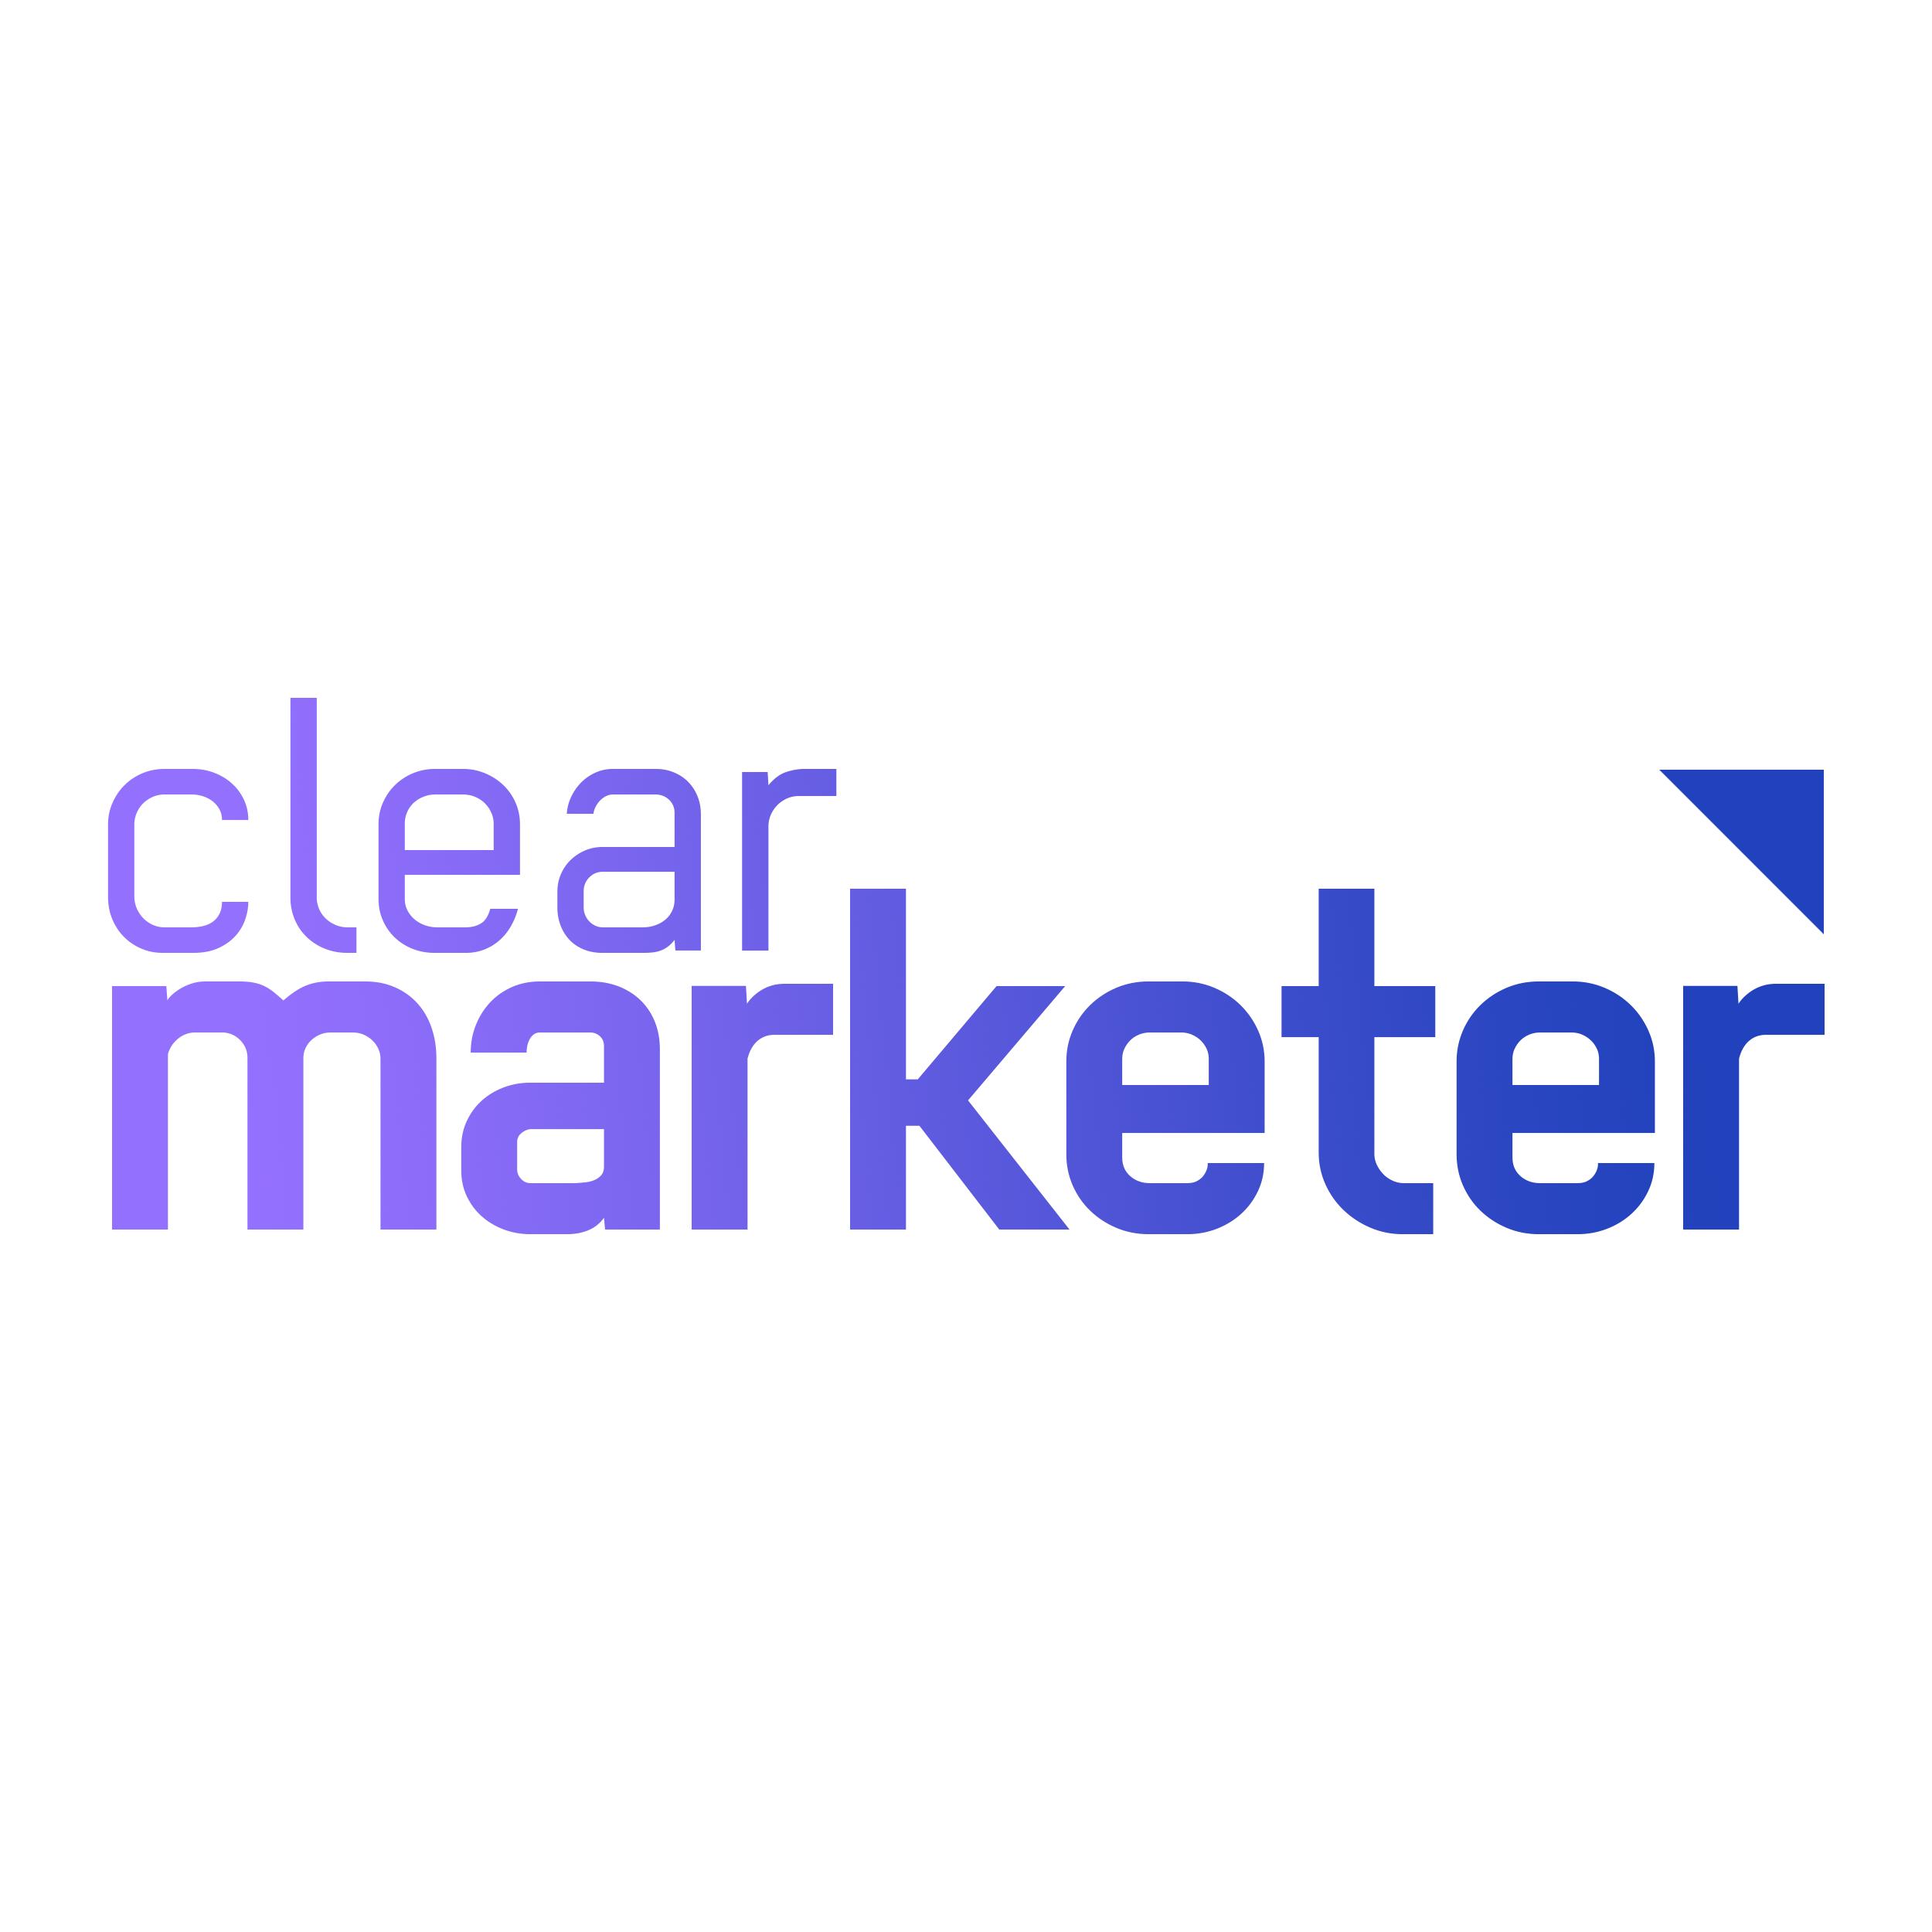 clearmarketer portfolio logo 2019.png